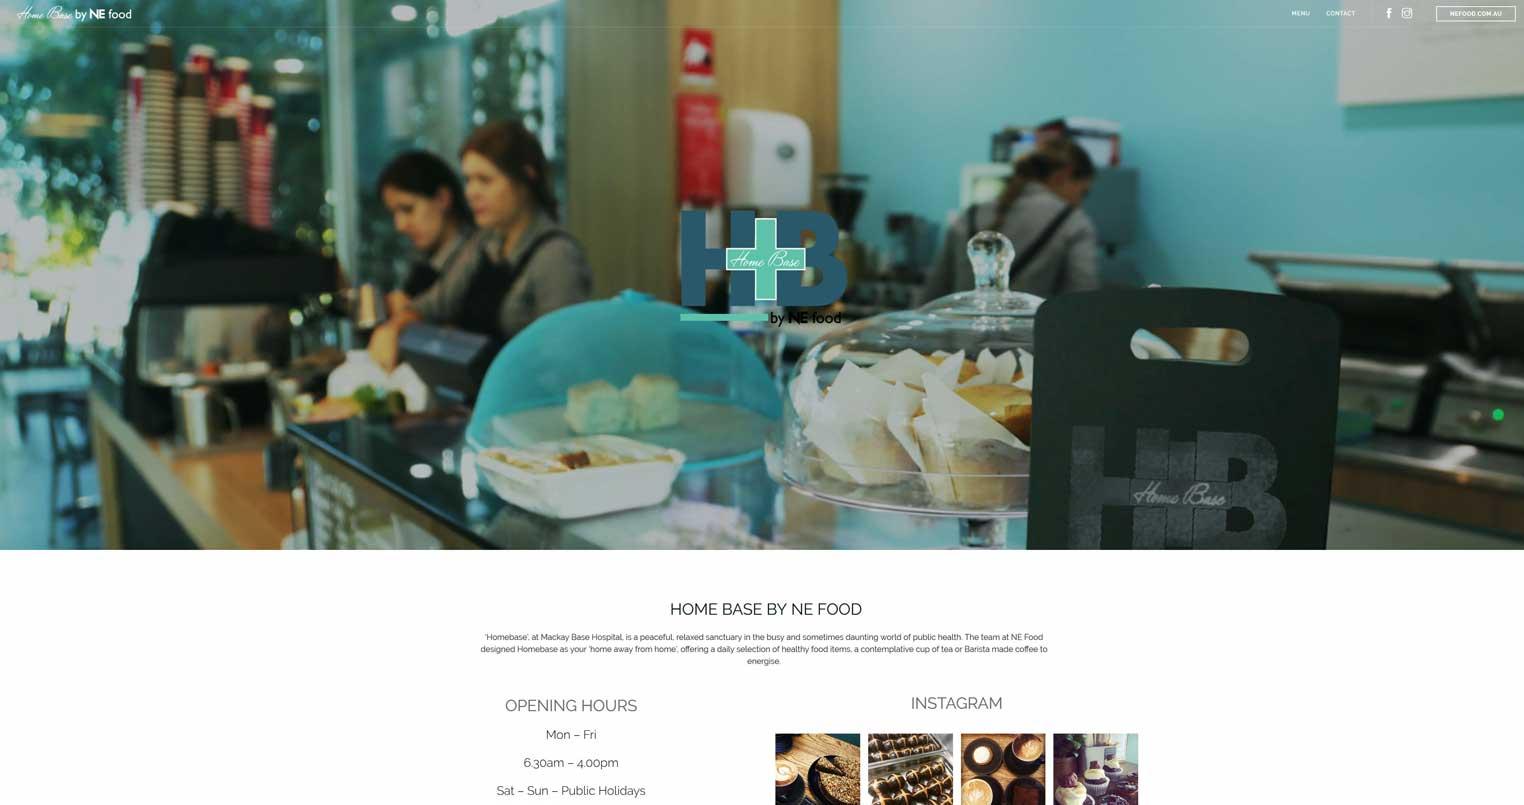 home-base-ne-food-pulman-dot-media-owen-pulman-web-design-mackay